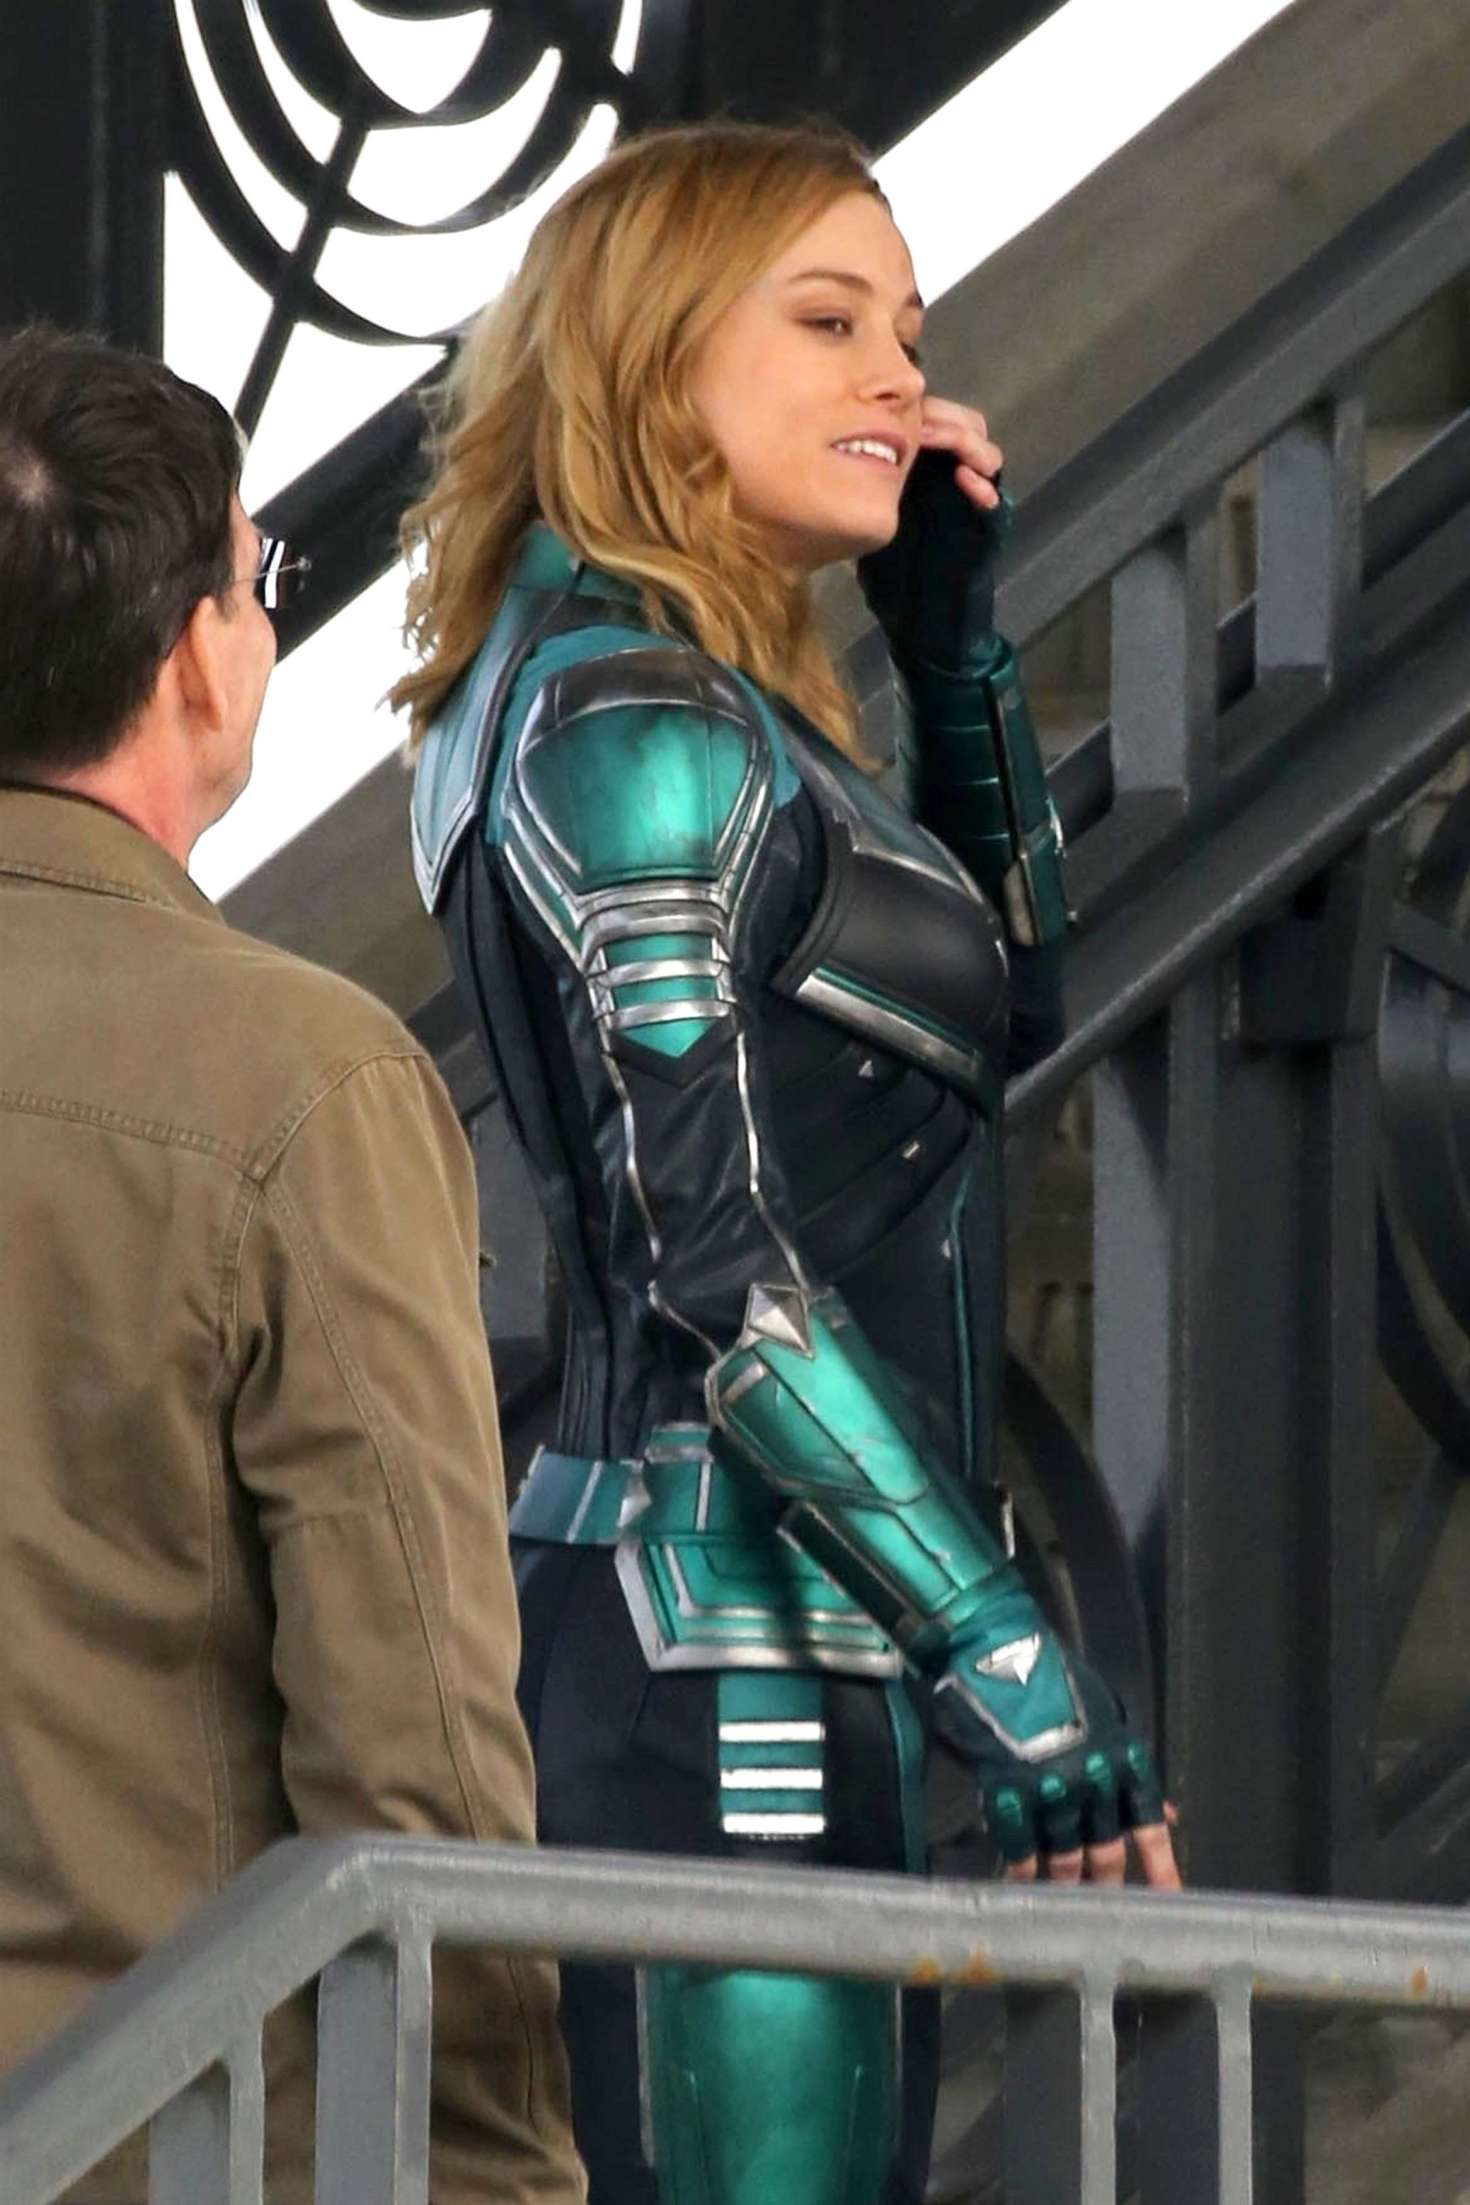 Brie Larson 2018 : Brie Larson: On the set of Captain Marvel -10